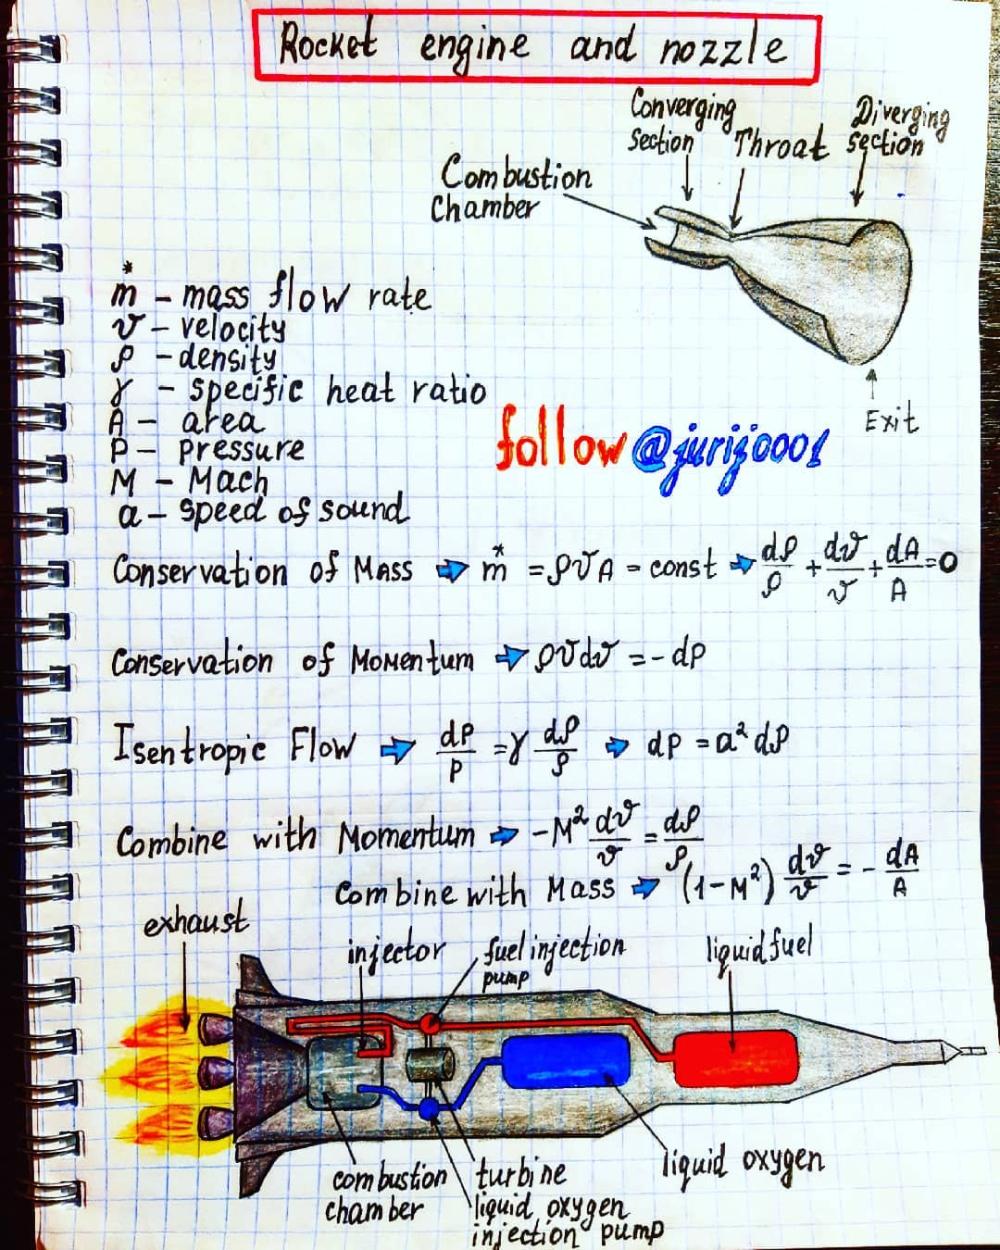 Rocket Engine And Nozzle Illustration By Physics Teacher Yuri Kovalenok Jurij0001 Physics And Mathematics Engineering Notes Physics Notes